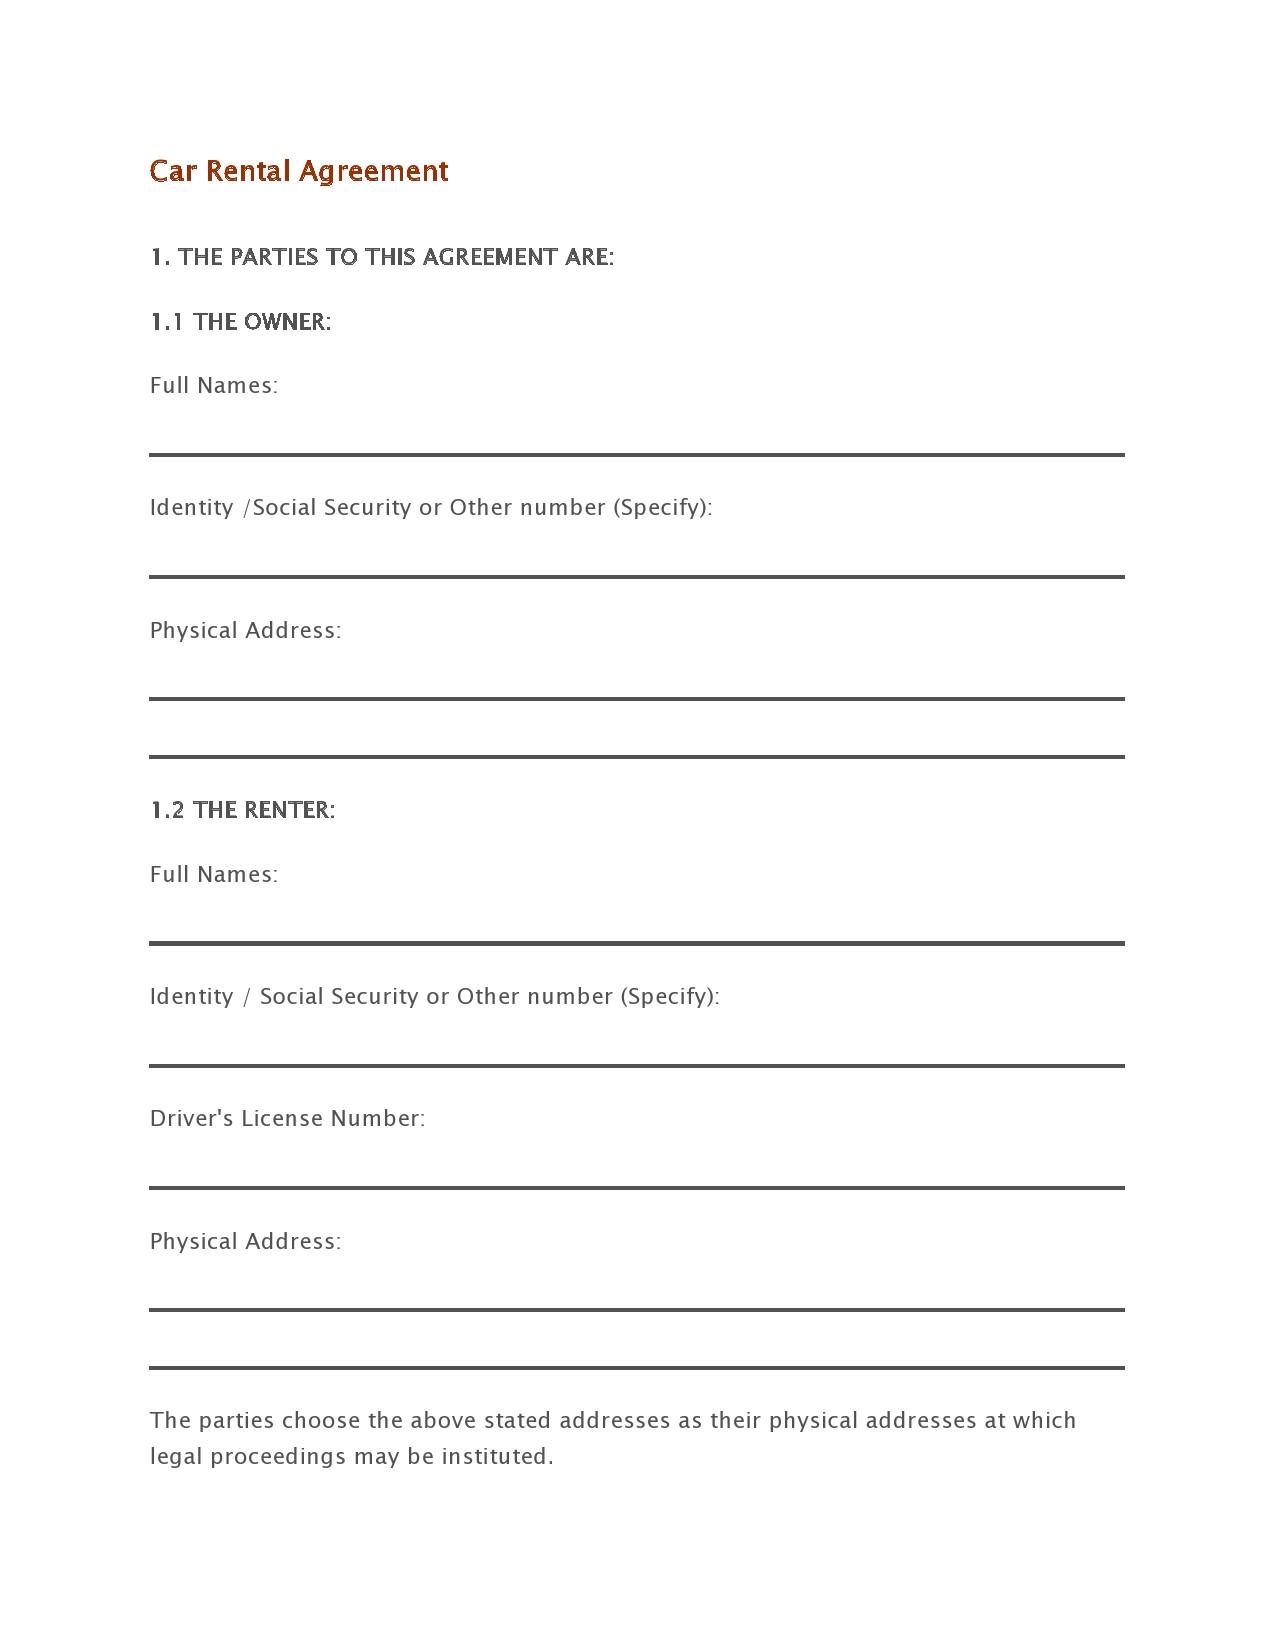 Free car rental agreement 14